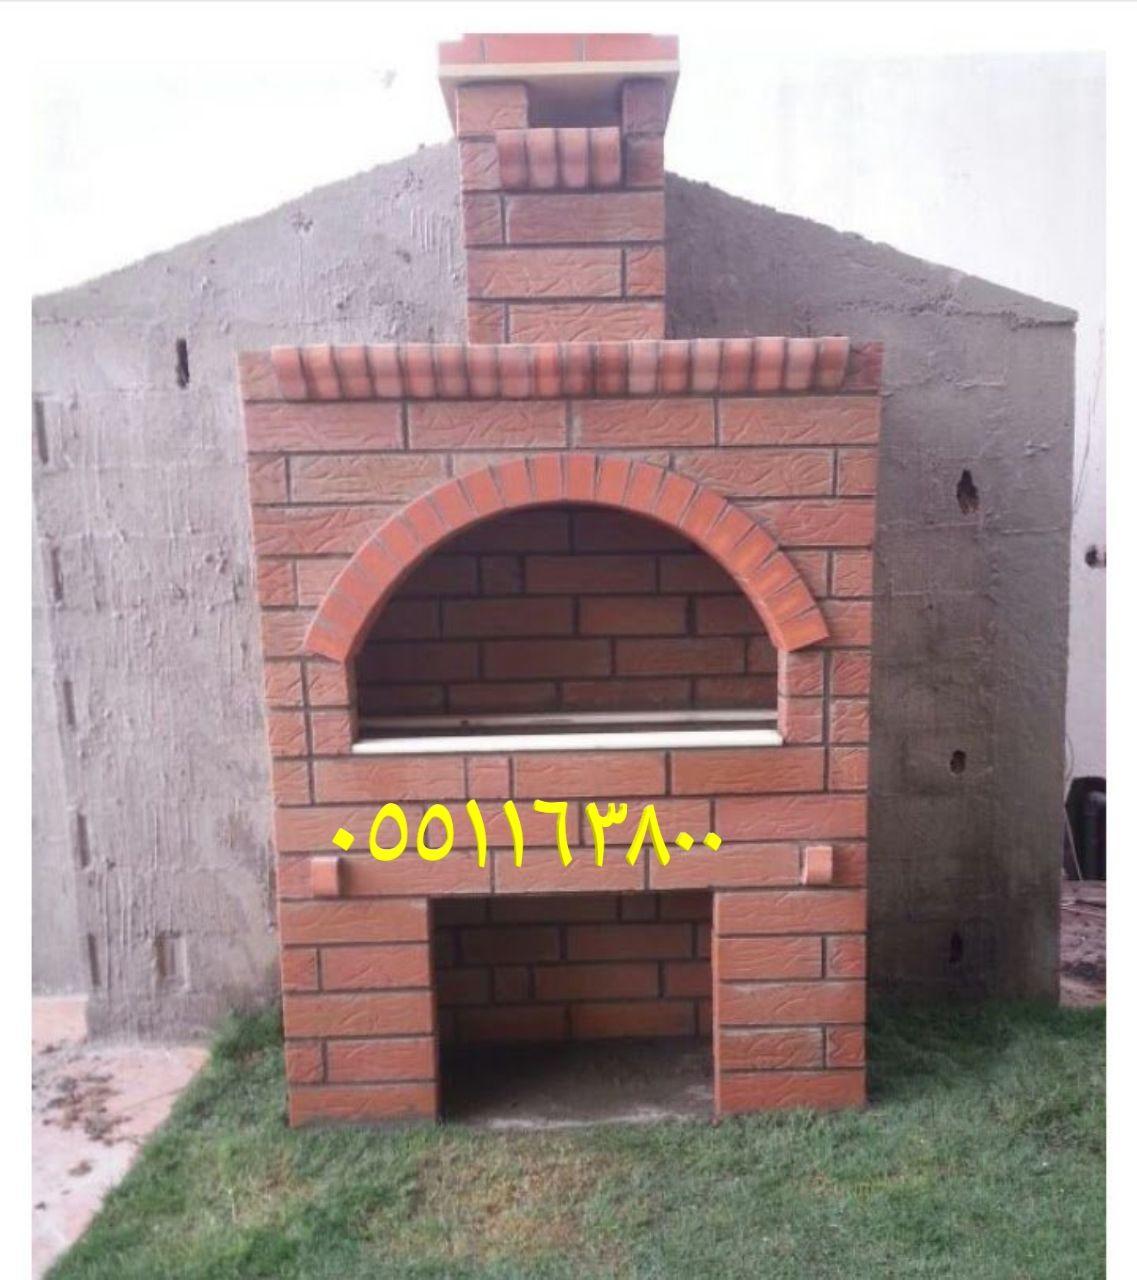 شوايات شاورما منزلية شوايات شاورما فحم شوايات ساكو فحم Home Home Decor Fireplace